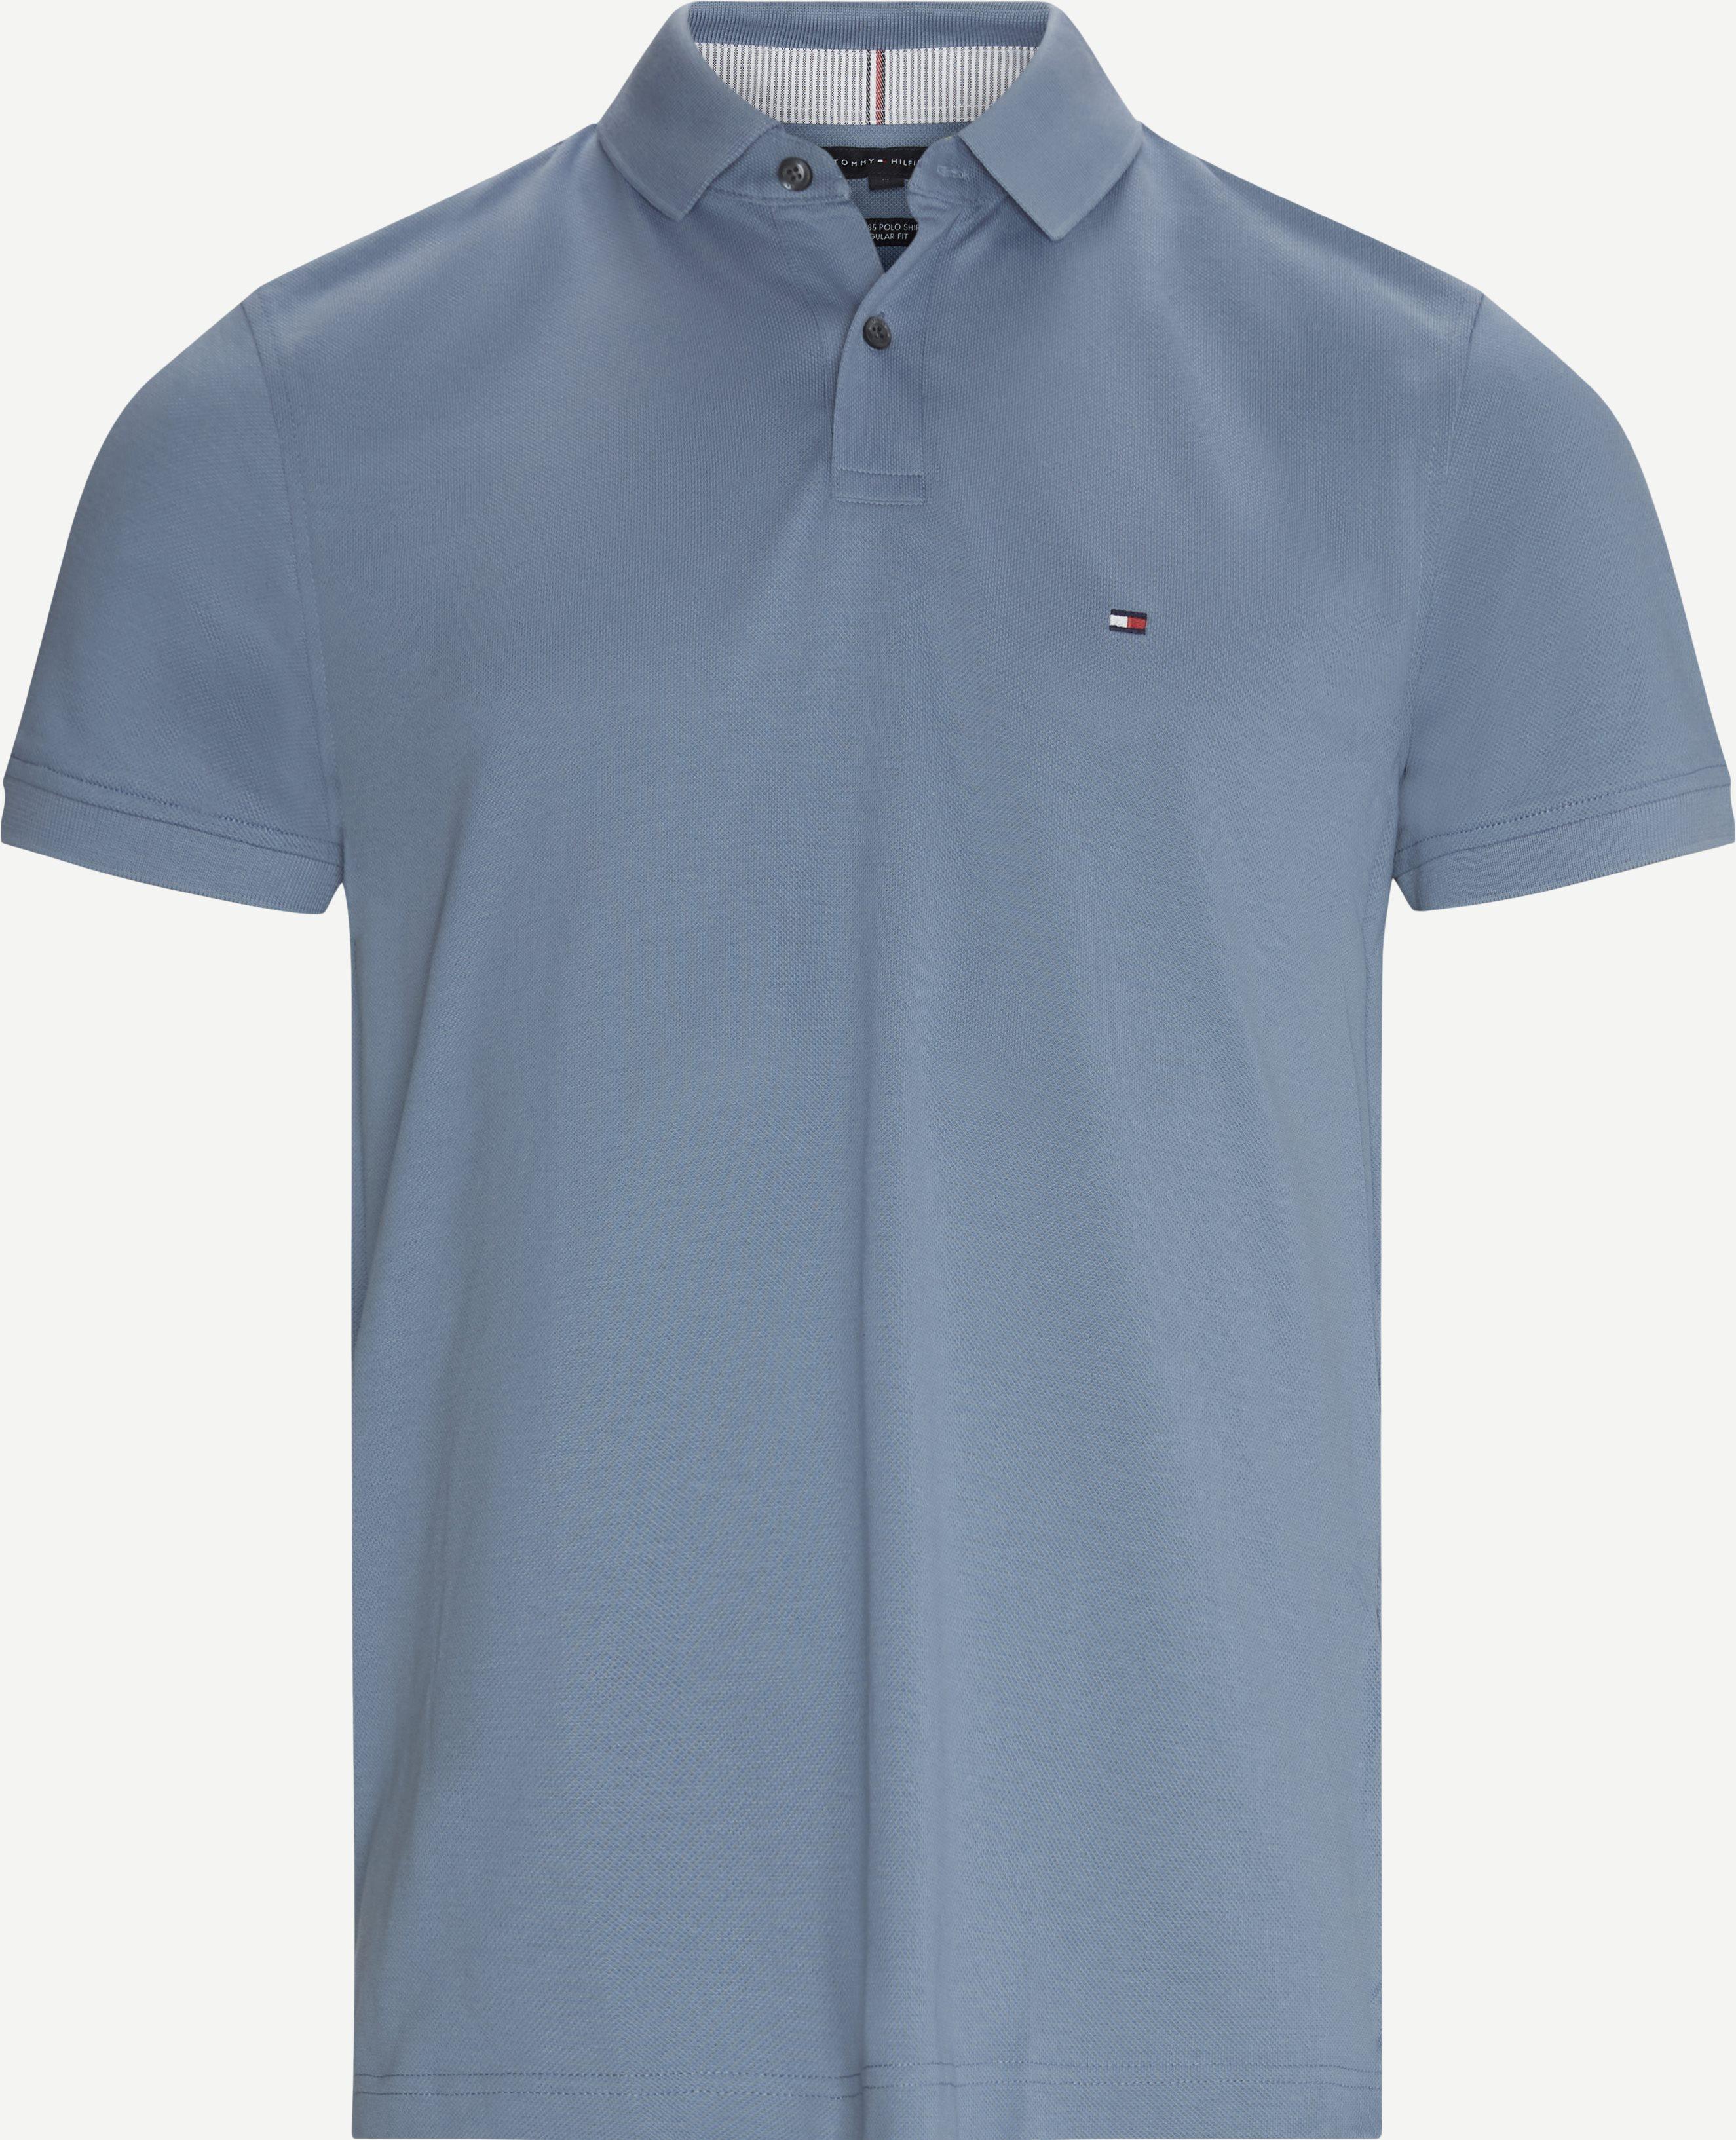 T-Shirts - Regular fit - Blau